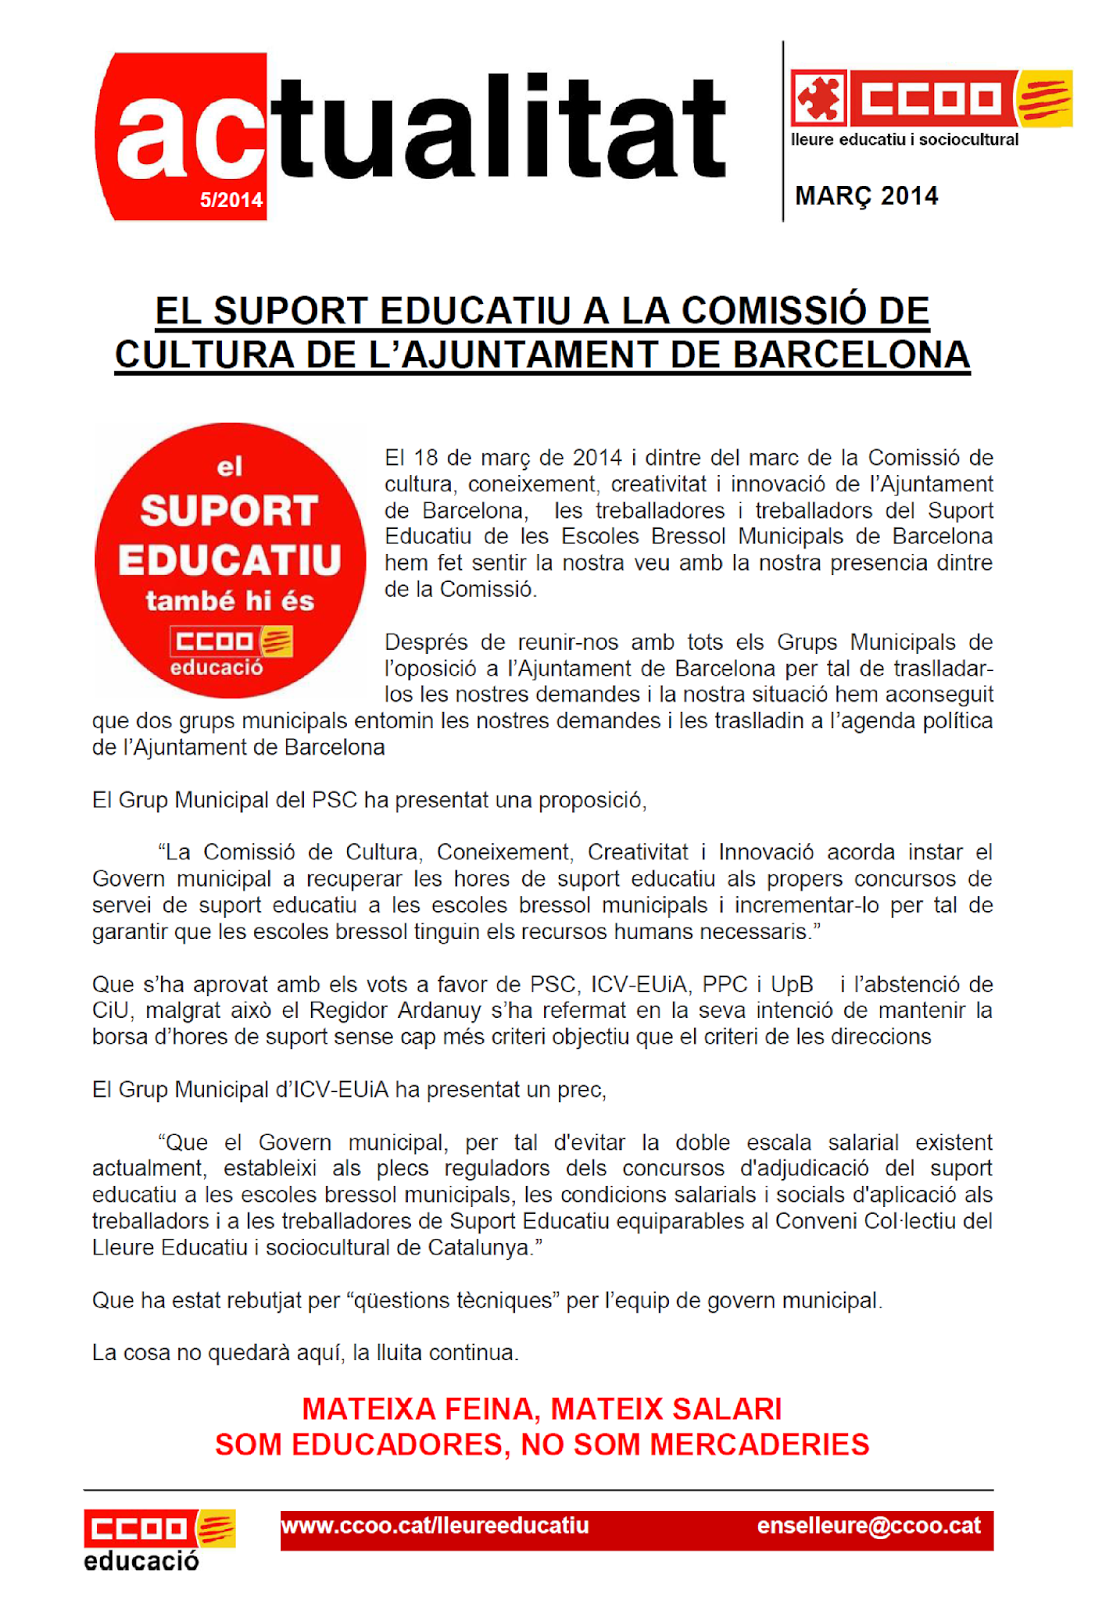 http://lleure.eformacio.org/sites/default/files/documents/ac_05_lleureeducatiu_2014_suport_educatiu.pdf